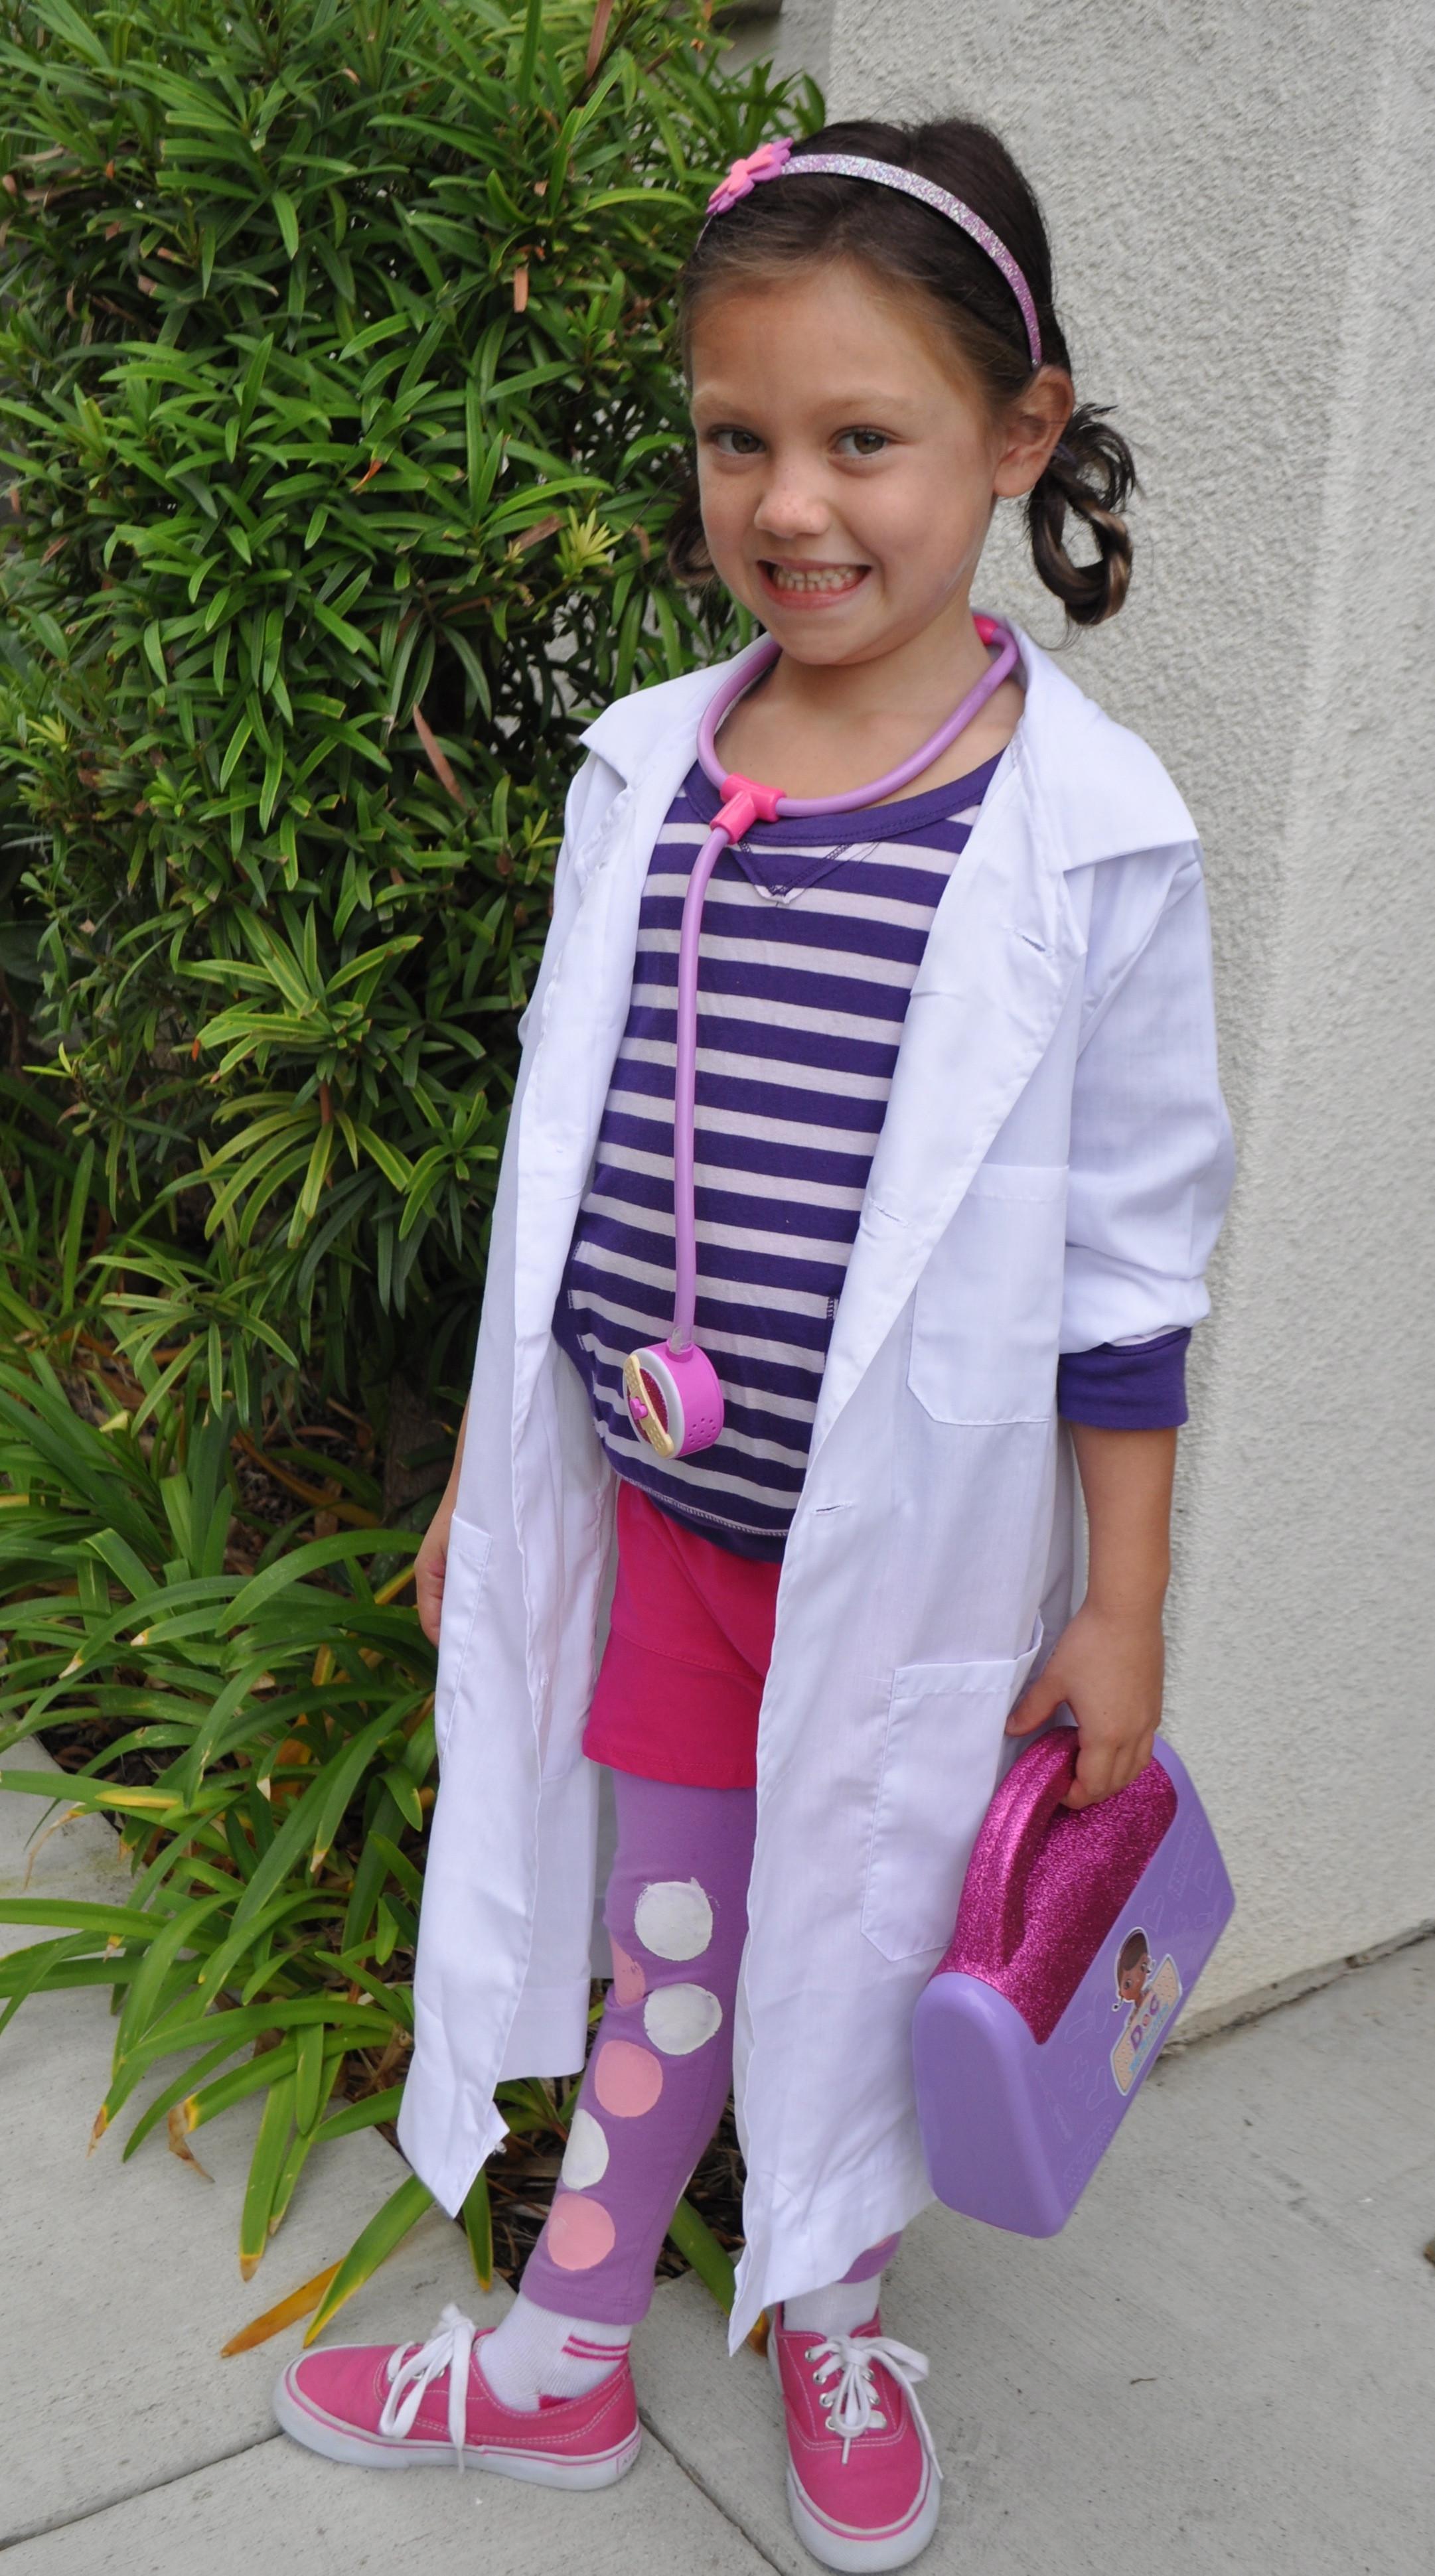 DIY Doc Mcstuffins Costume  25 creative DIY costumes for girls